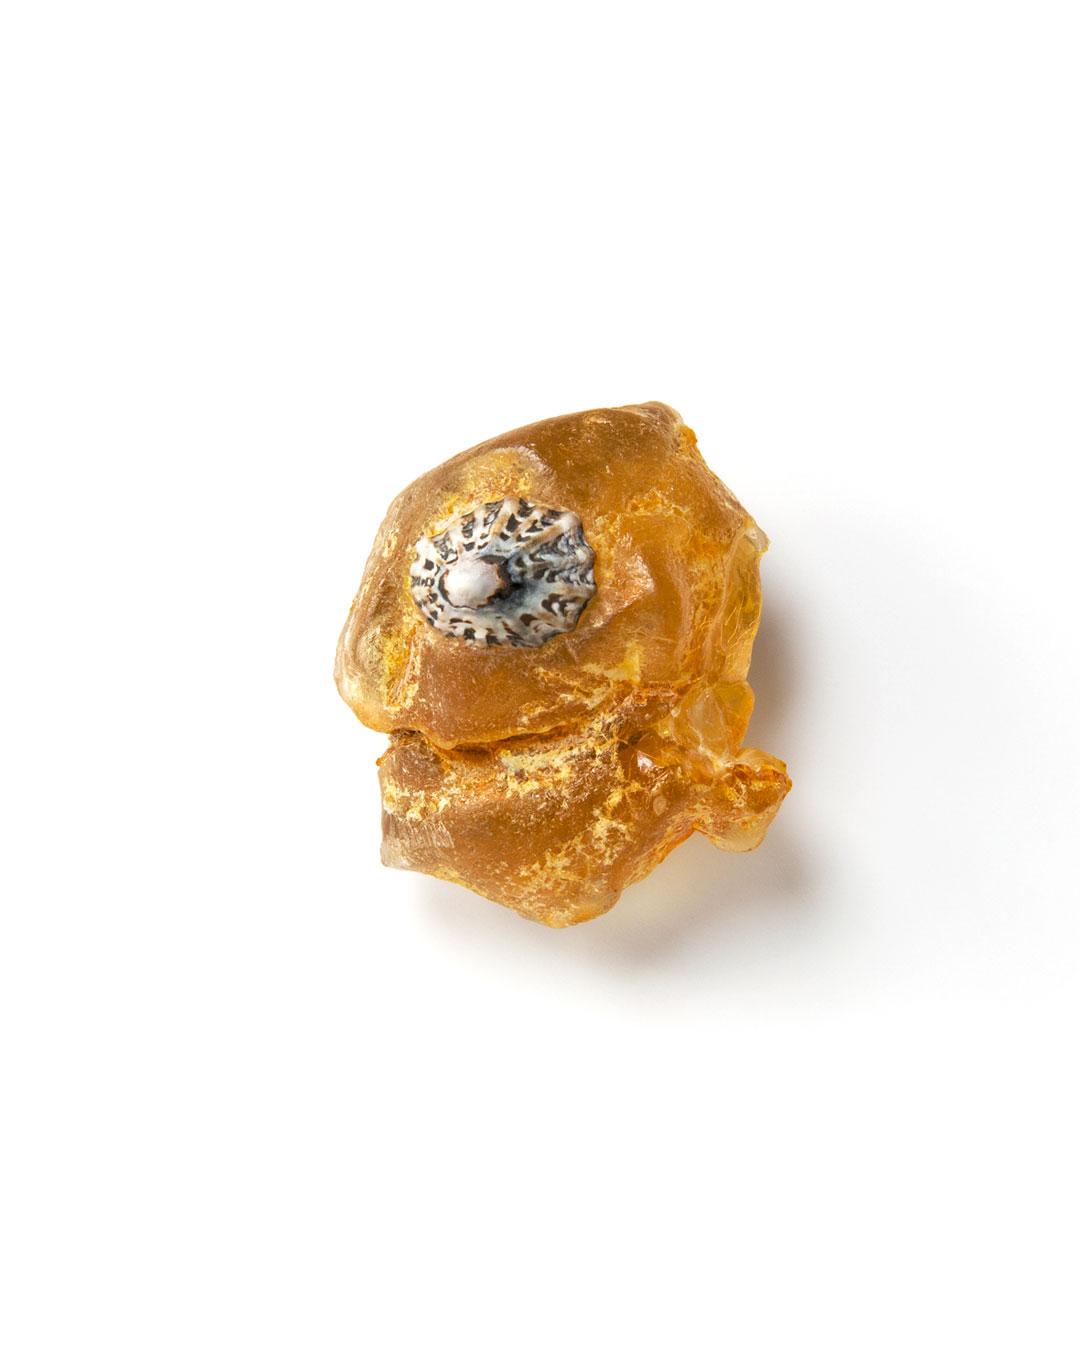 Otto Künzli, Quidam XI, 2017, brooch; amber, patellidae, MDF, silver, 42 x 37 x 19 mm, €3900